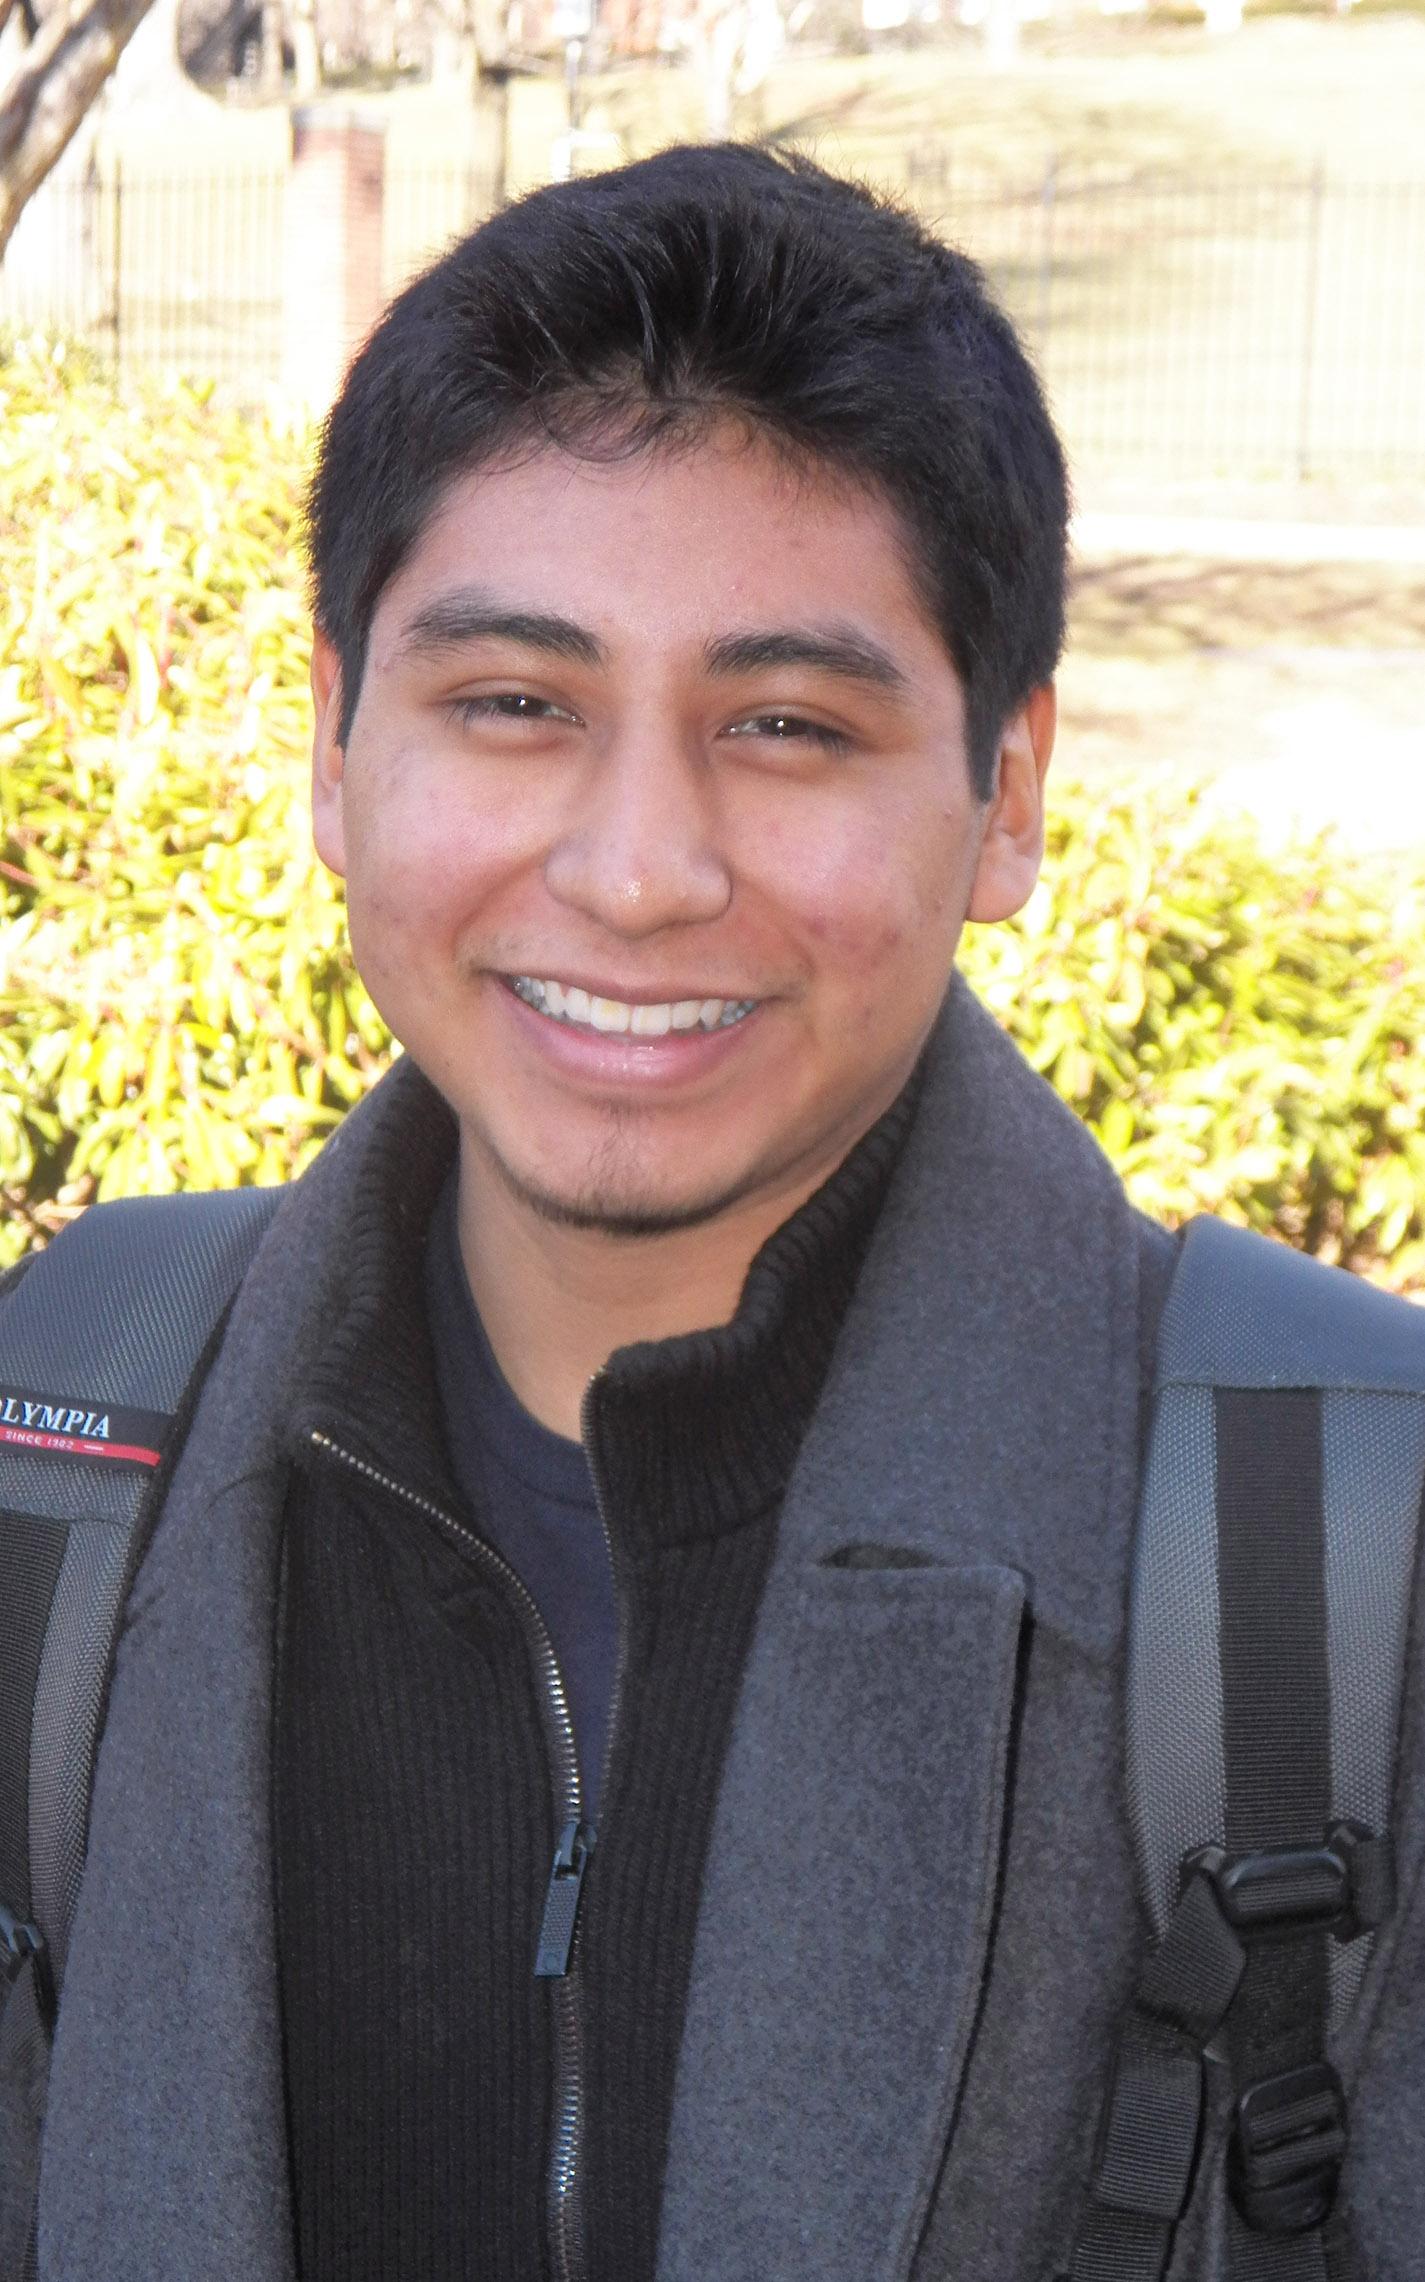 Erick,MCN Fellow 2014 - 2015